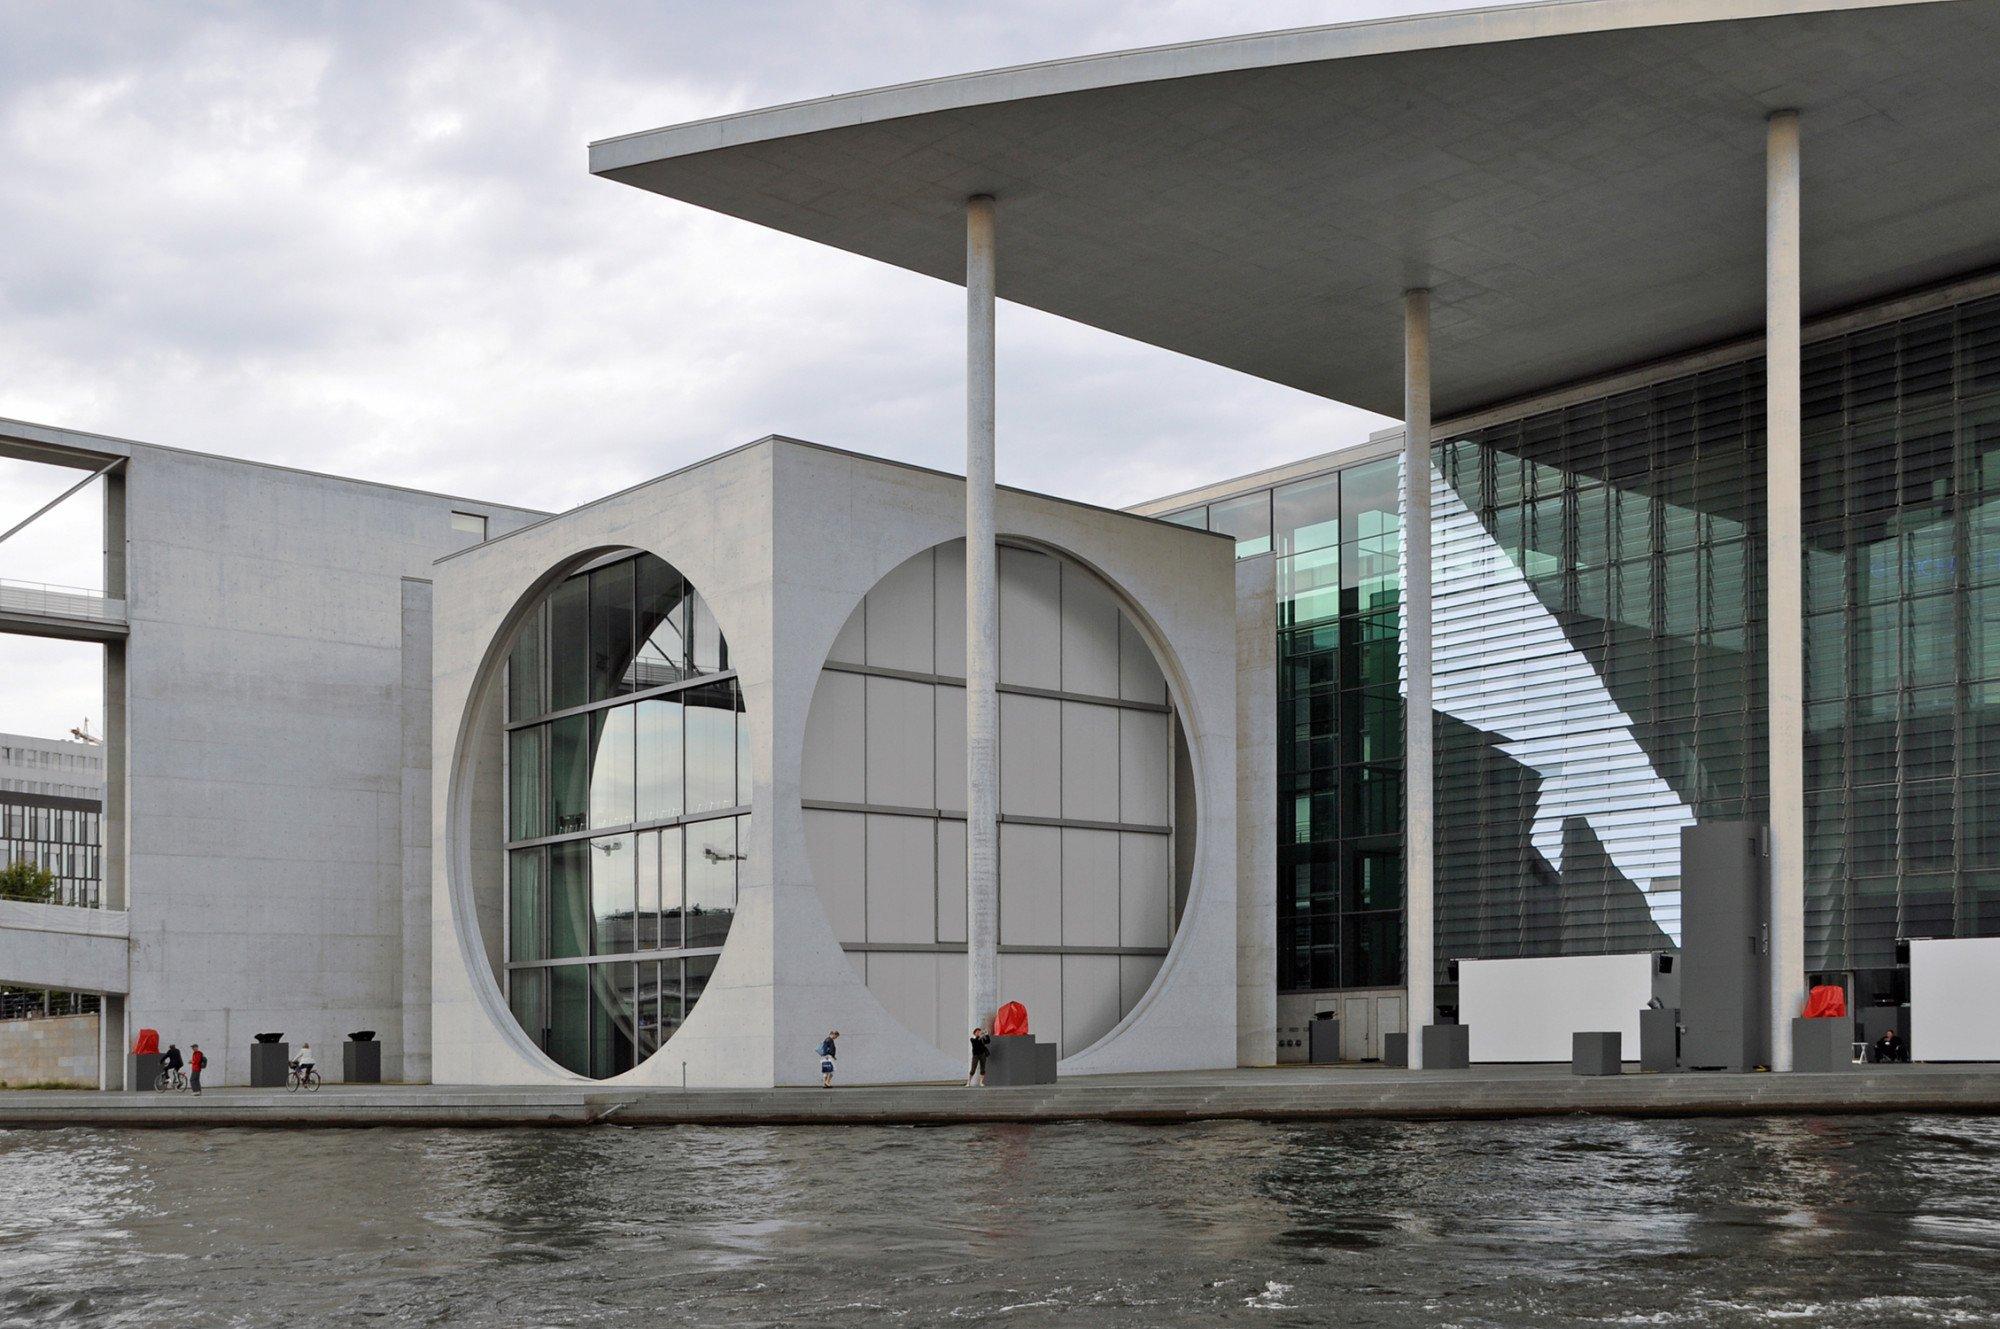 St tzen beton skelettbau baunetz wissen - Skelettbau architektur ...